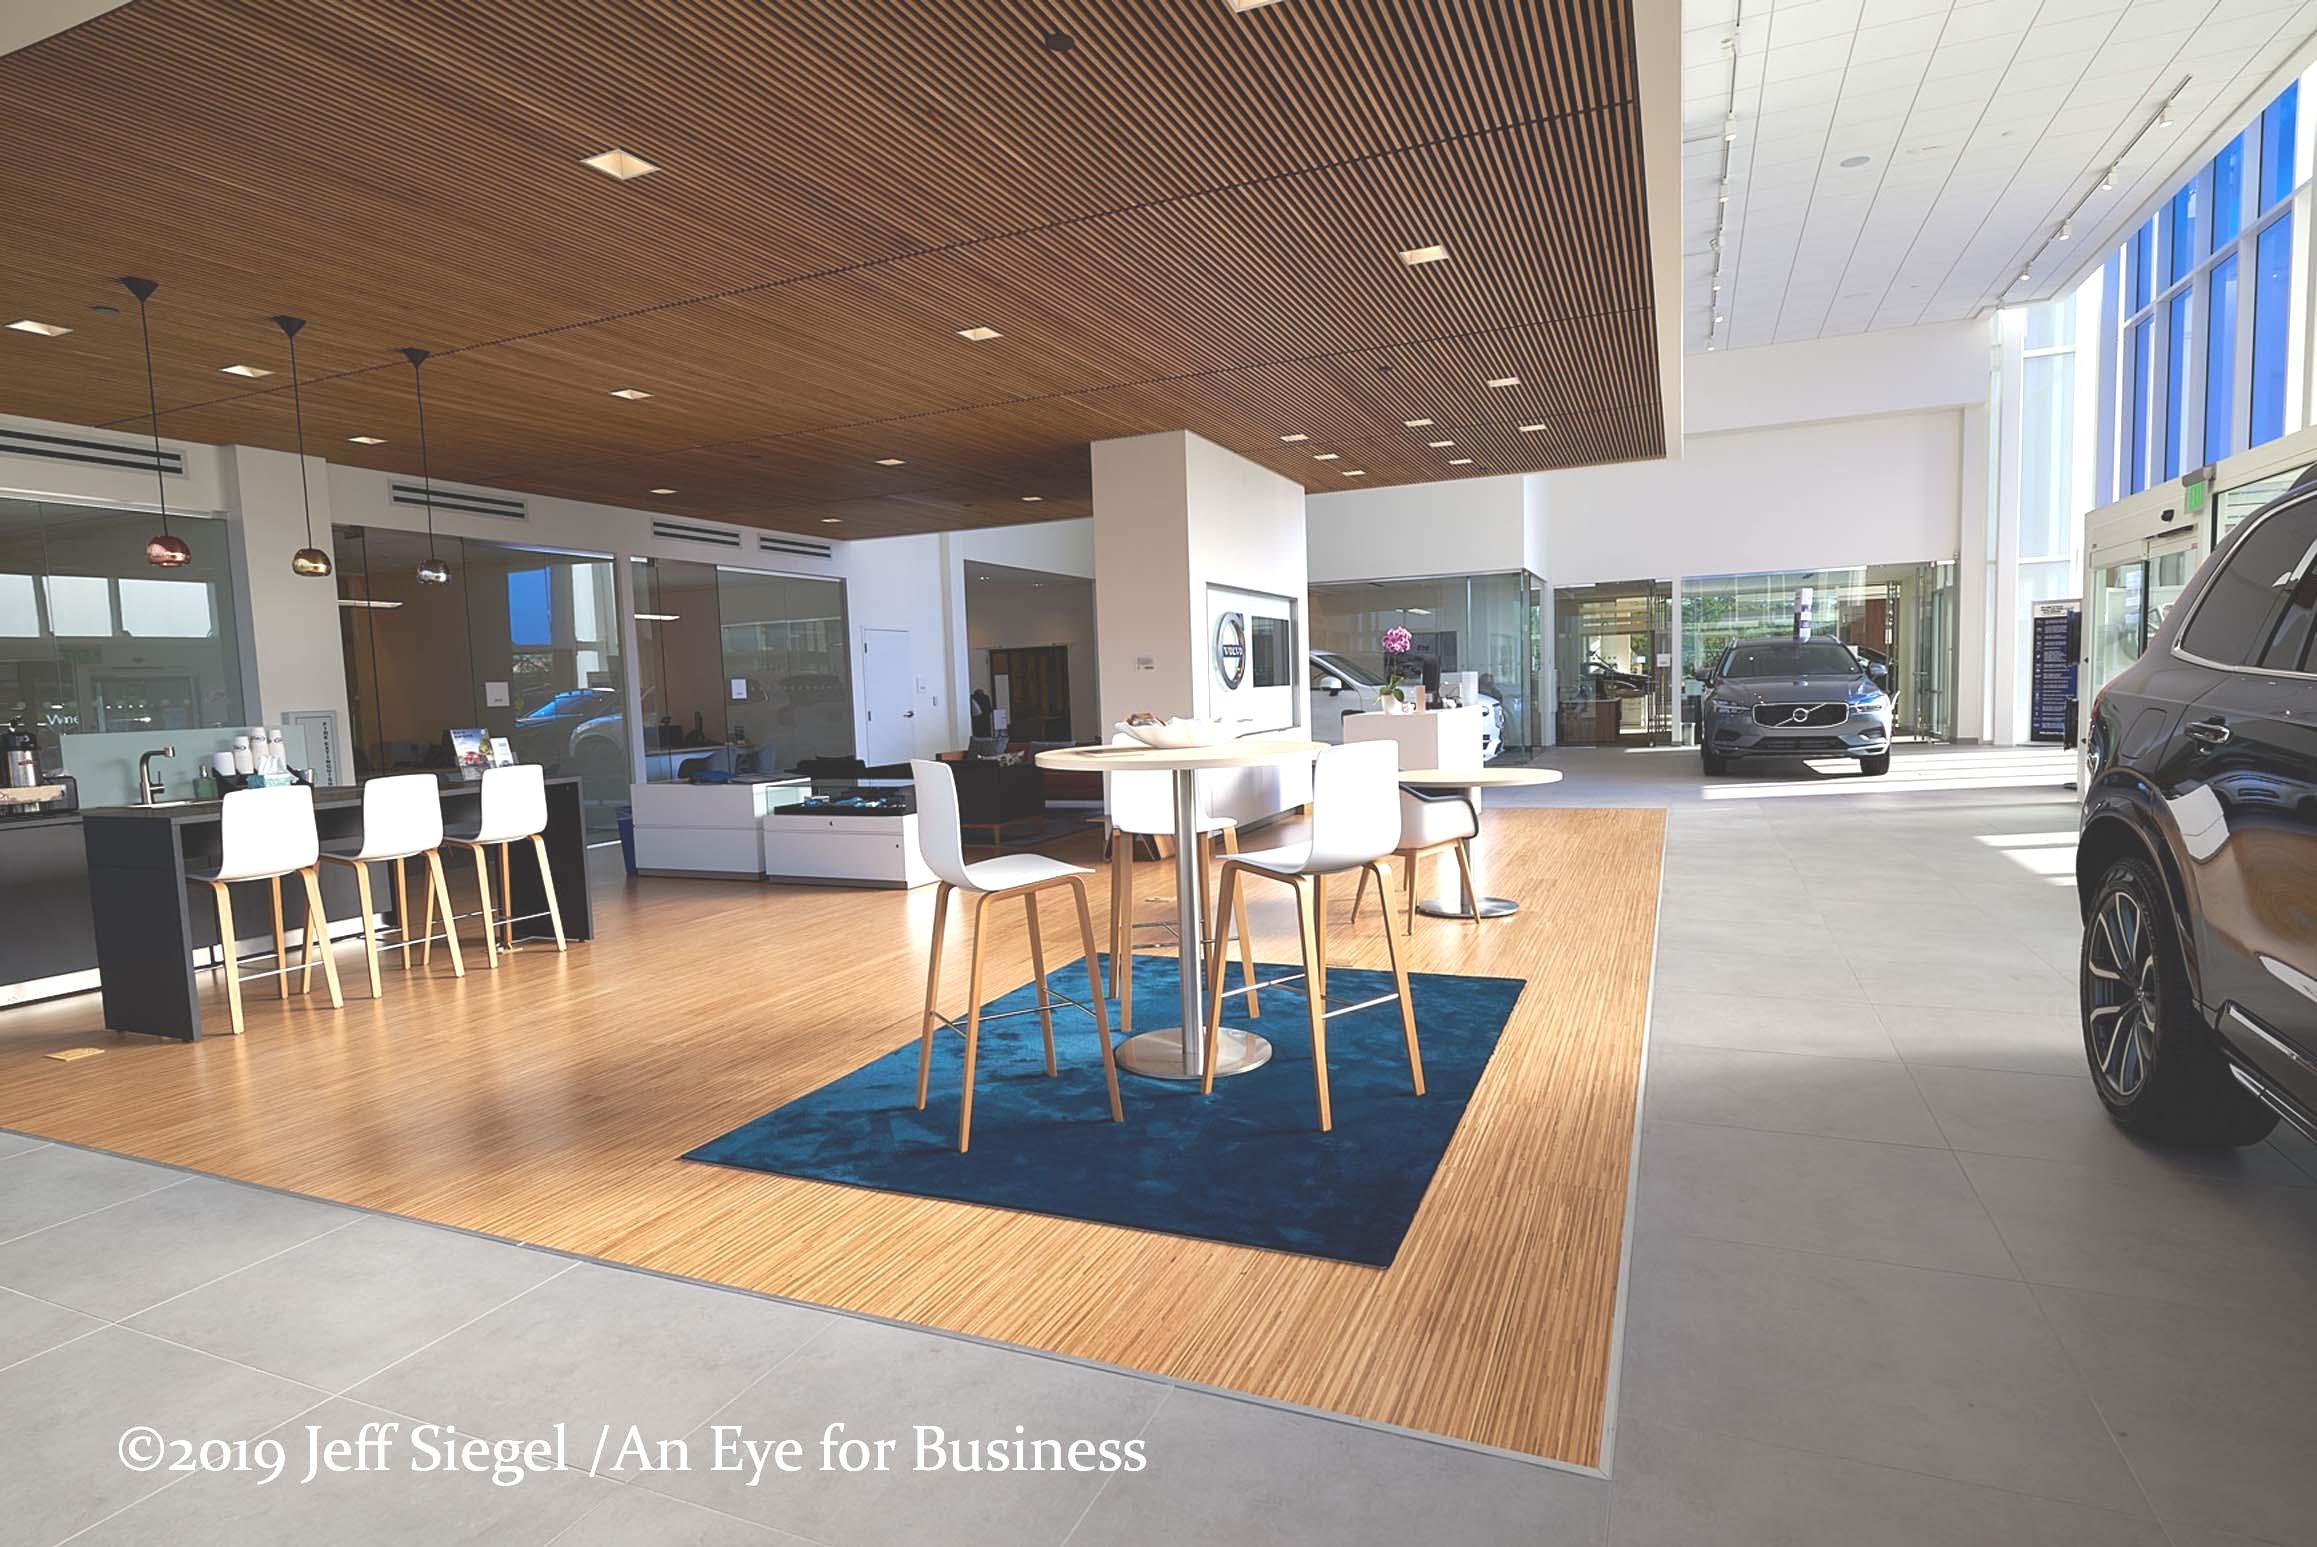 Volvo--Lounge-side-view-web.jpg